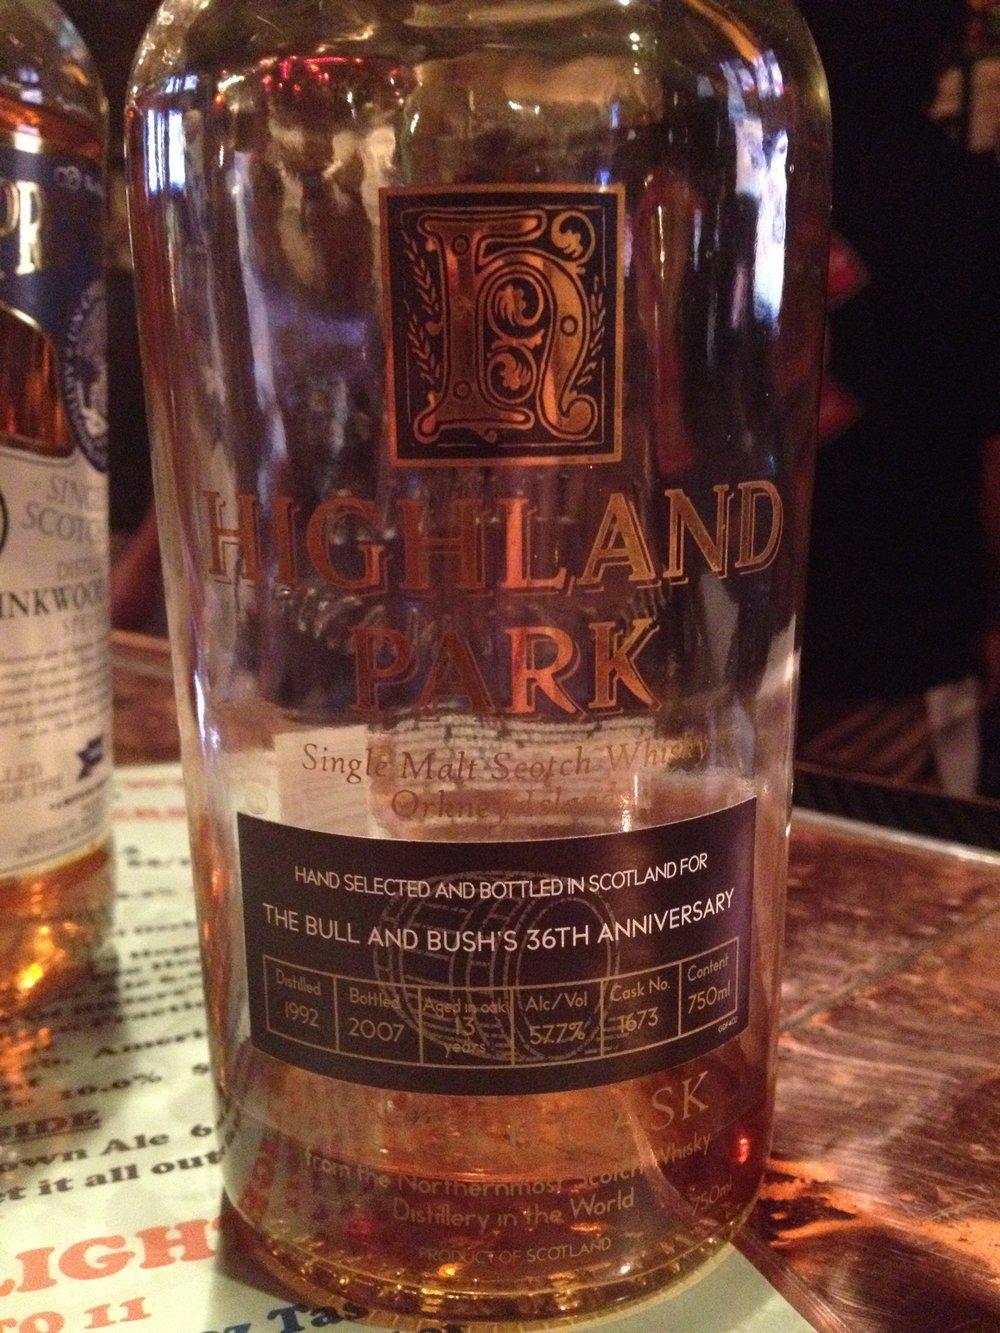 13 Year Old | 57.7% ABV - Distillery | Highland Park